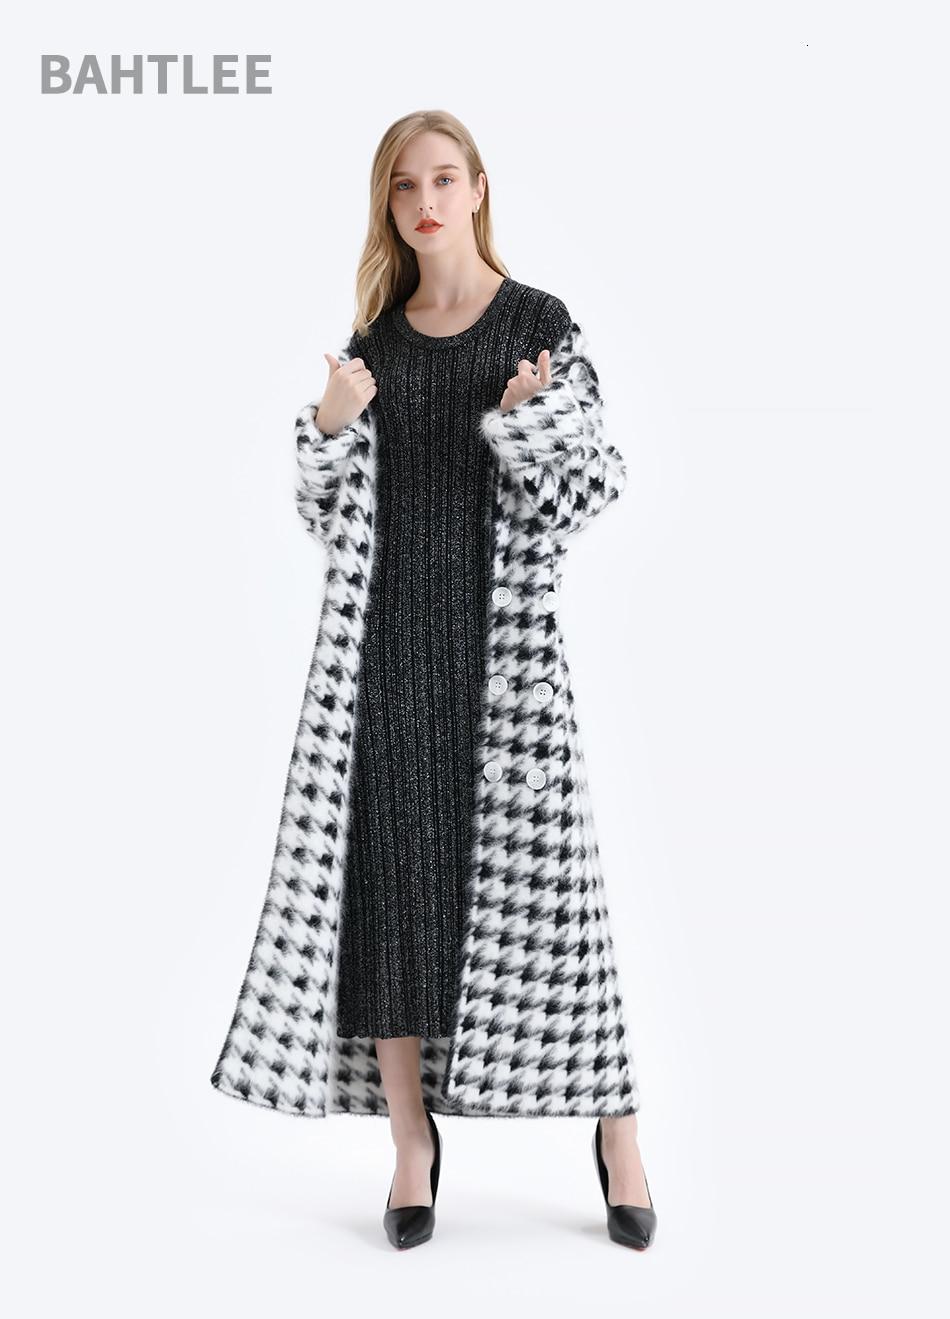 BAHTLEE Women Angora Long Coat Houndstooth Pattern Sweater Winter Wool Knitted Cardigans Jumper Turn Down Collar Long Sleeves 10